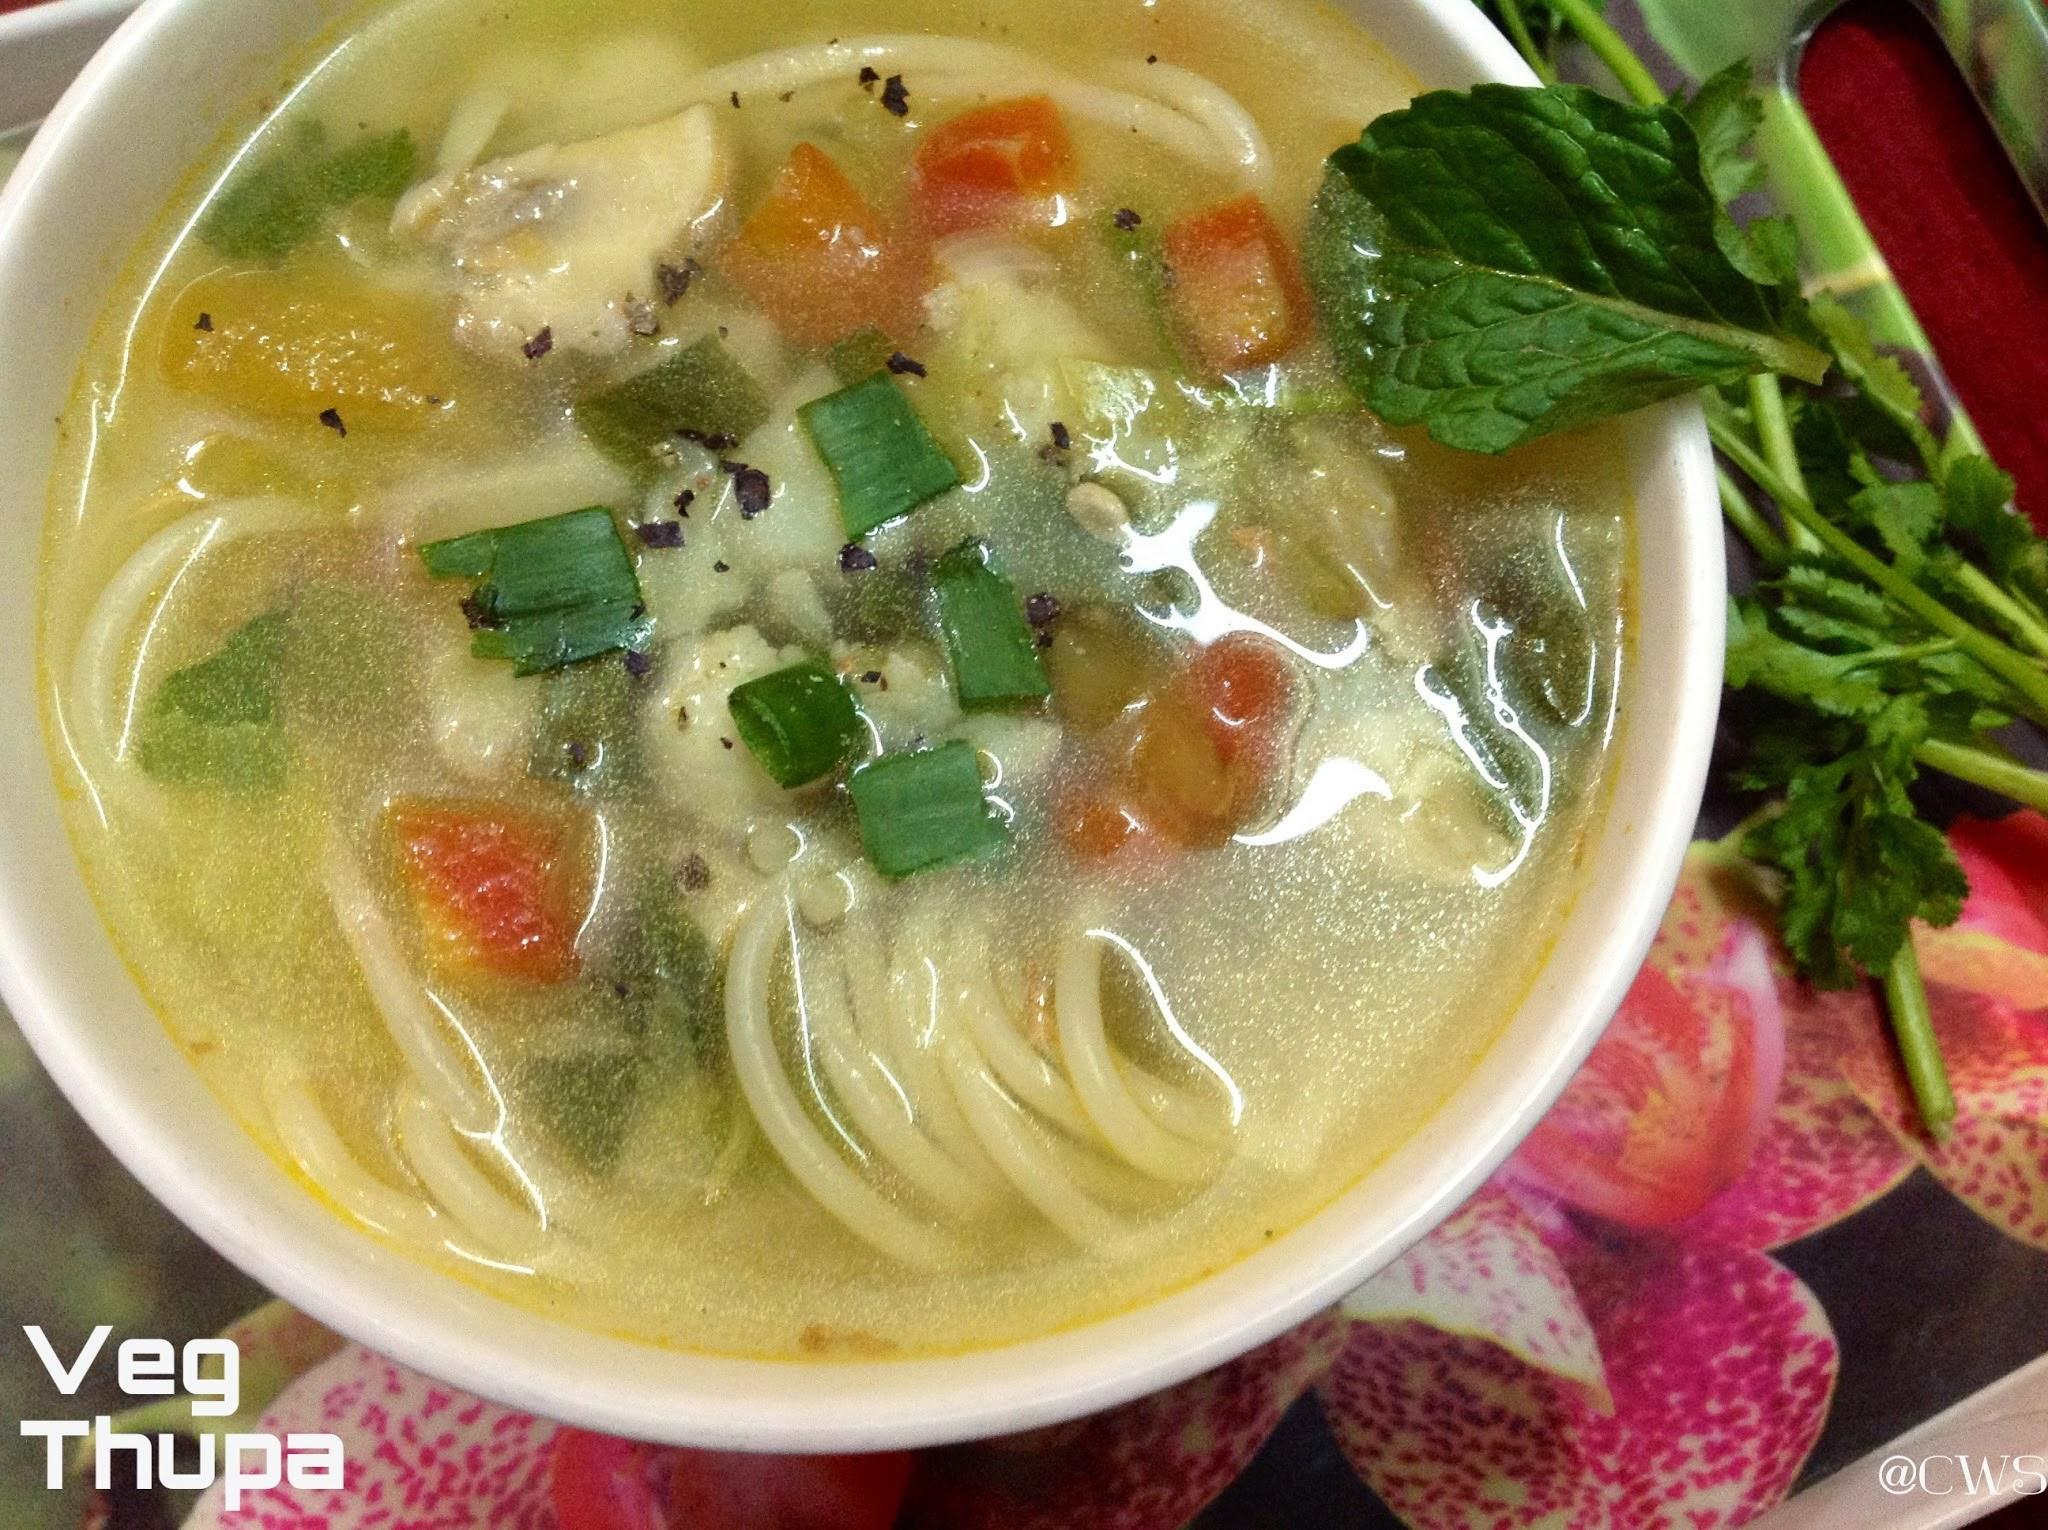 Arunachal pradesh veg thukpa cookingwithsapana for Arunachal pradesh cuisine